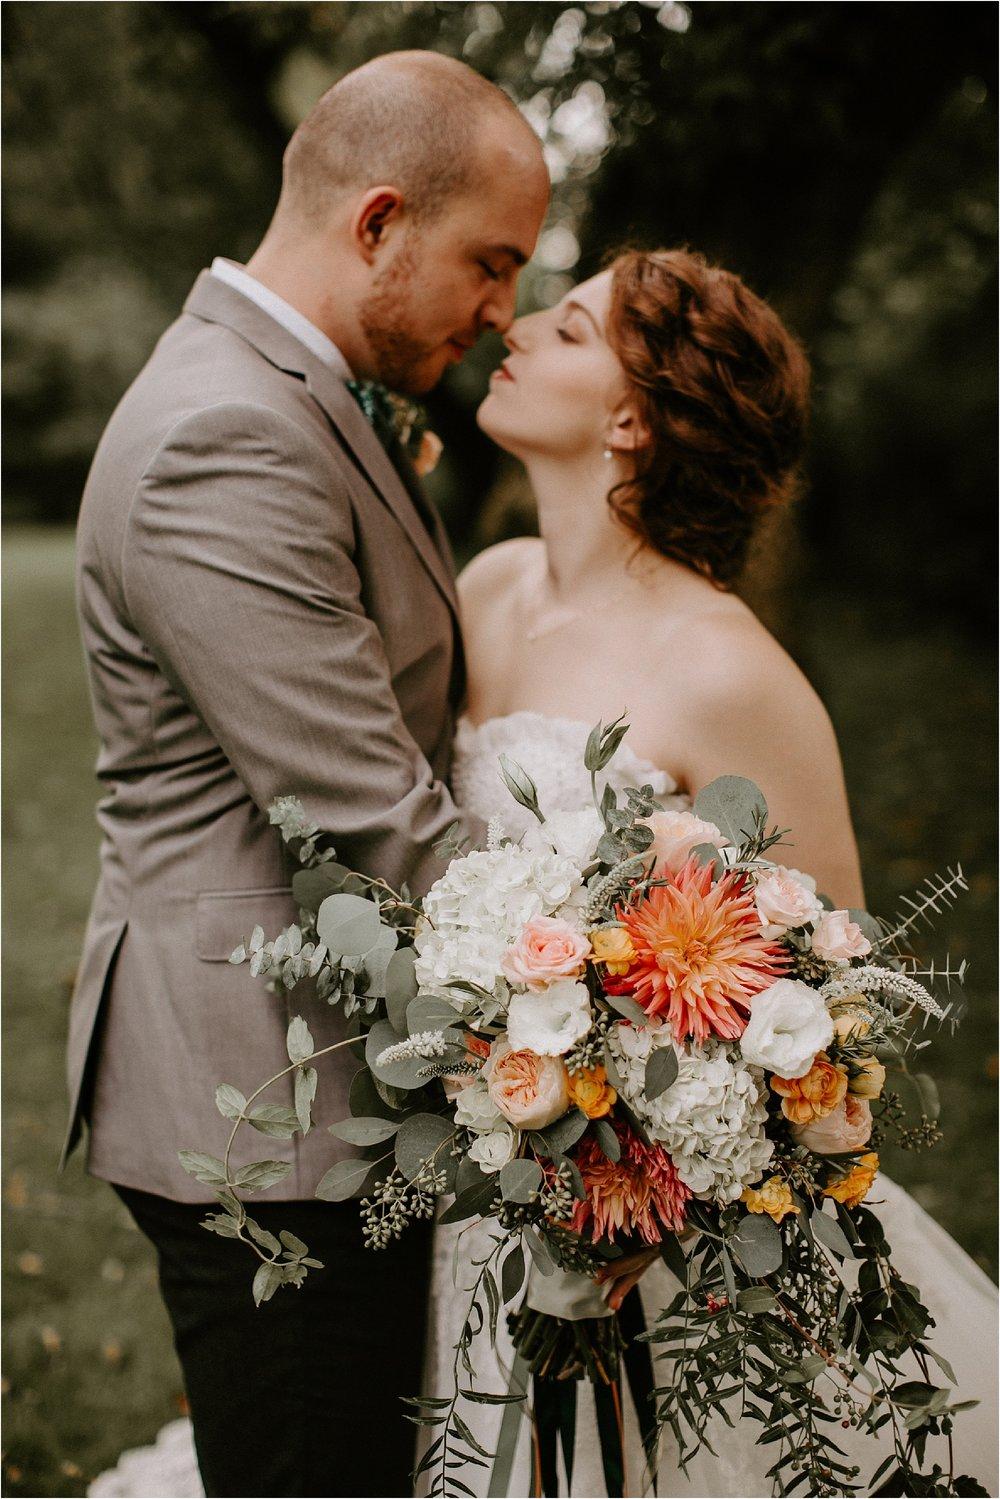 Sarah_Brookhart_Lancaster_Wedding_Photographer_0020.jpg